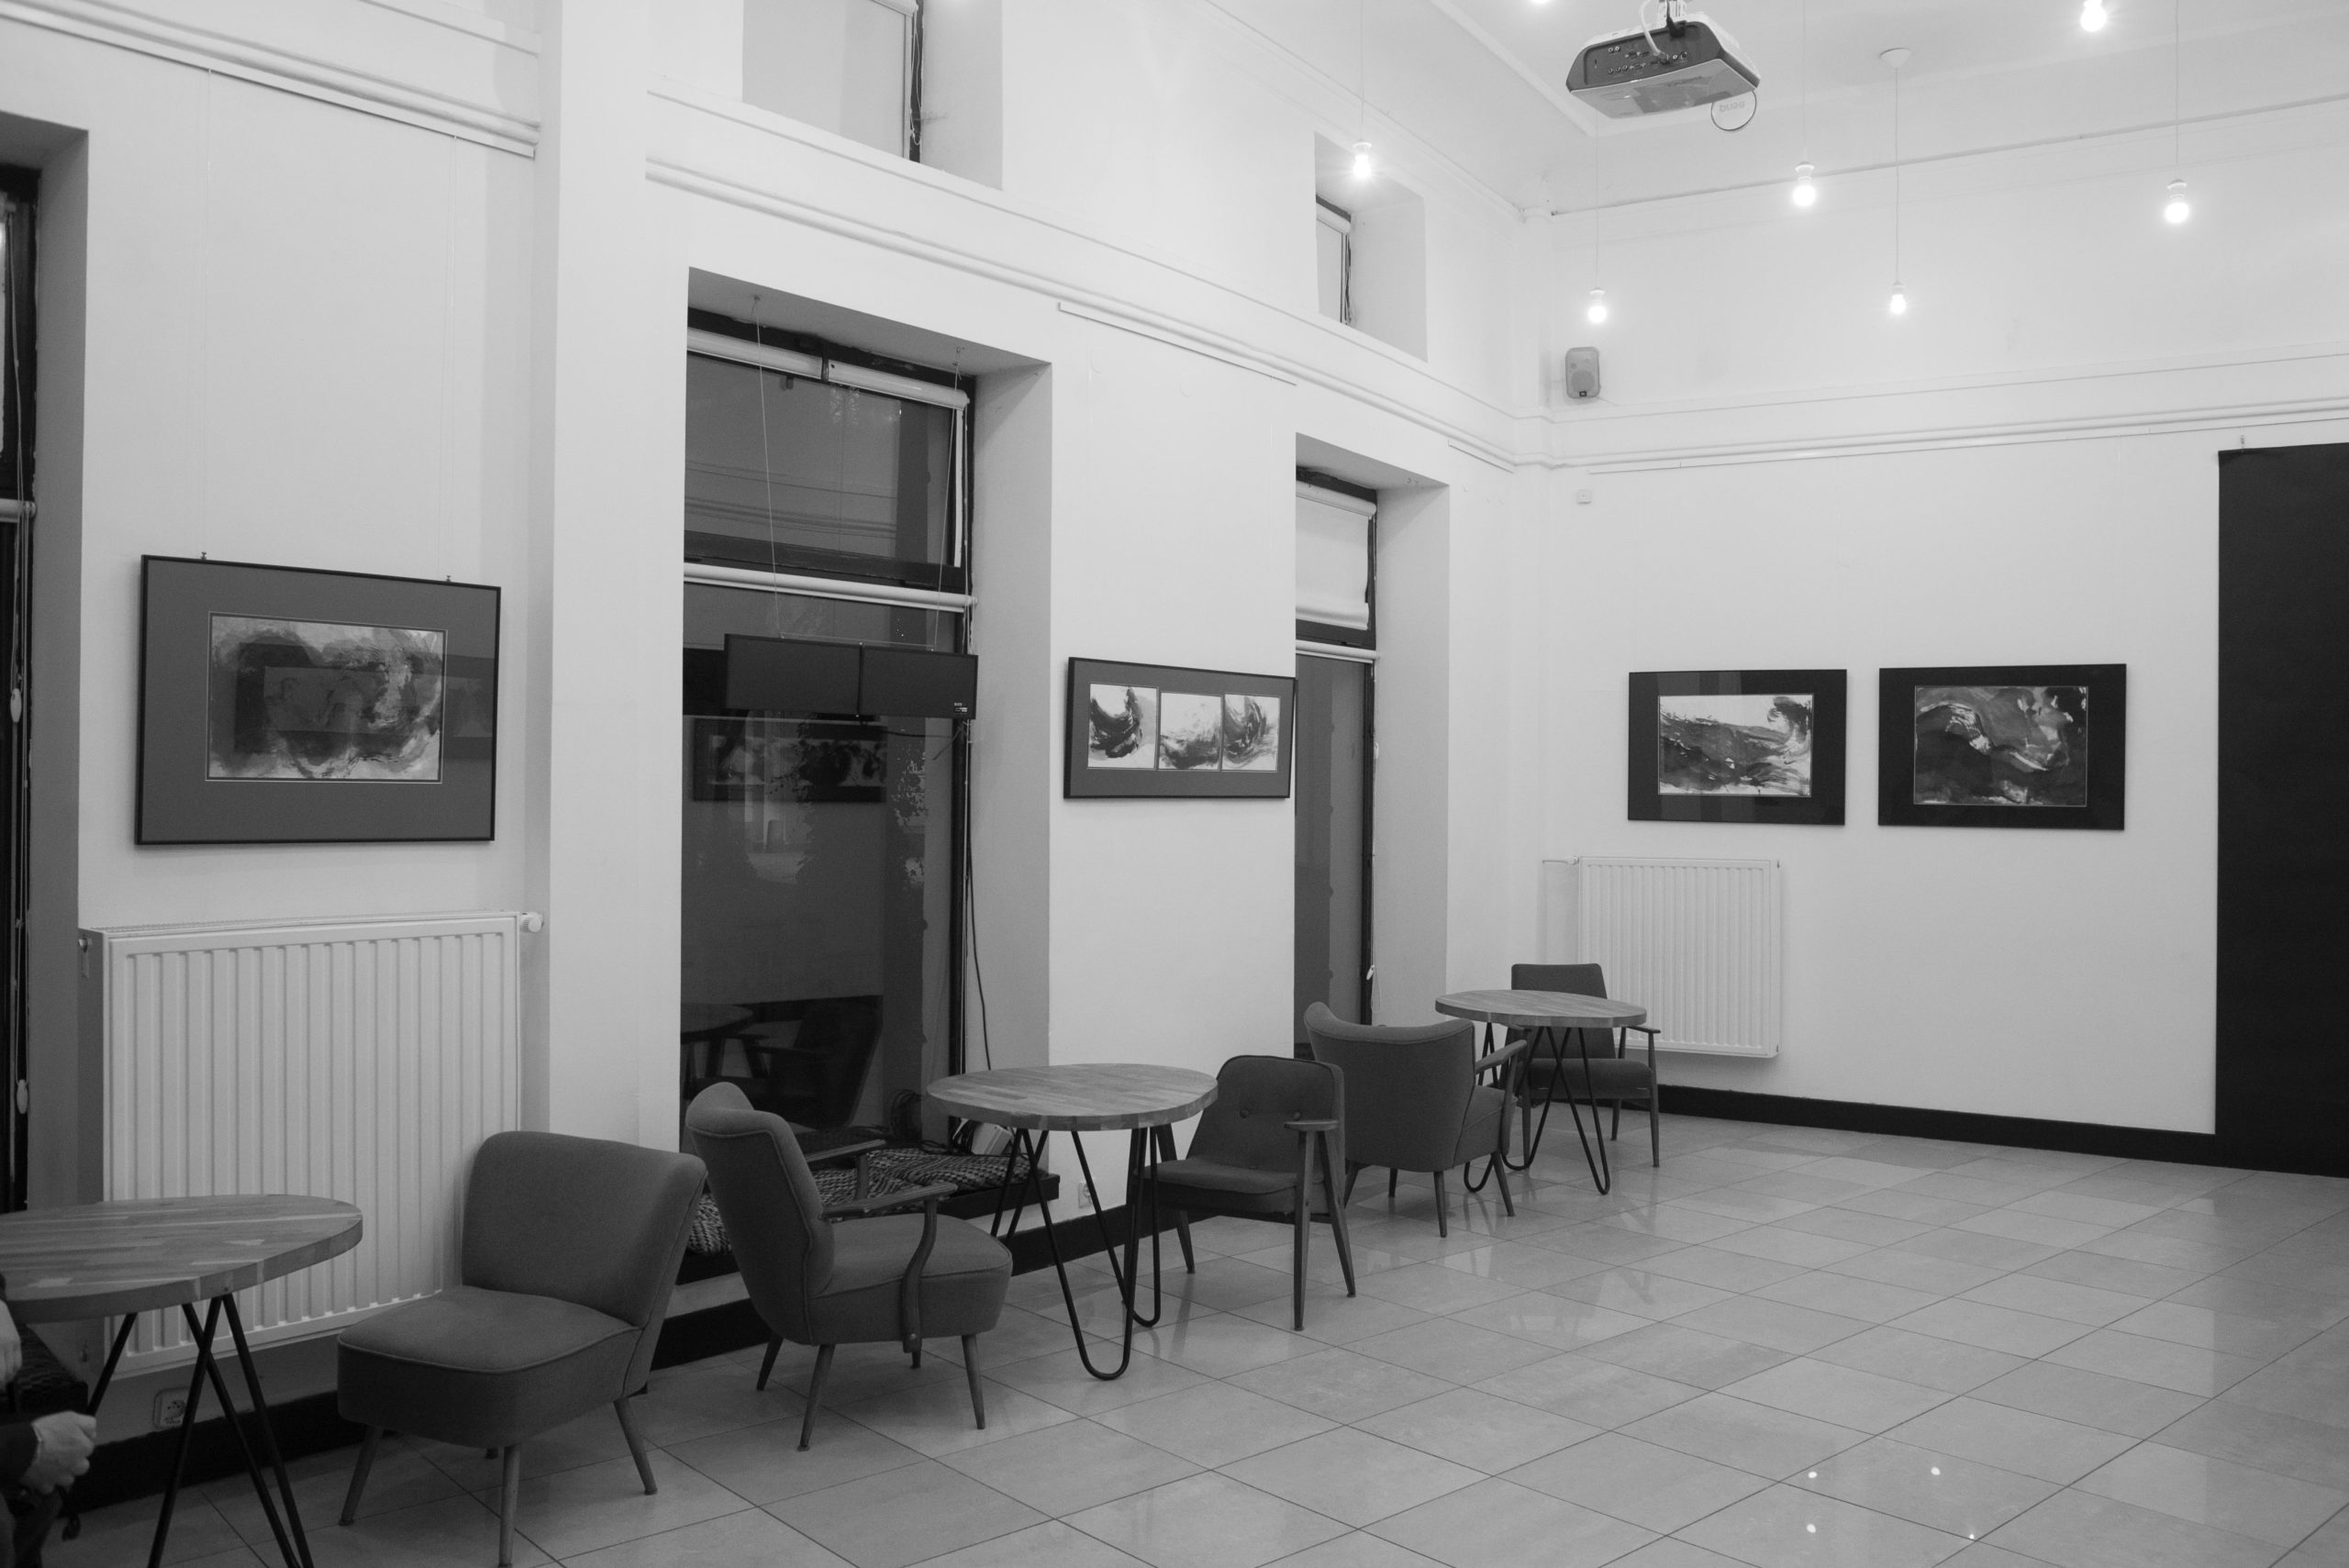 Exhibition at Stacja Muranów, Warsaw, 2017